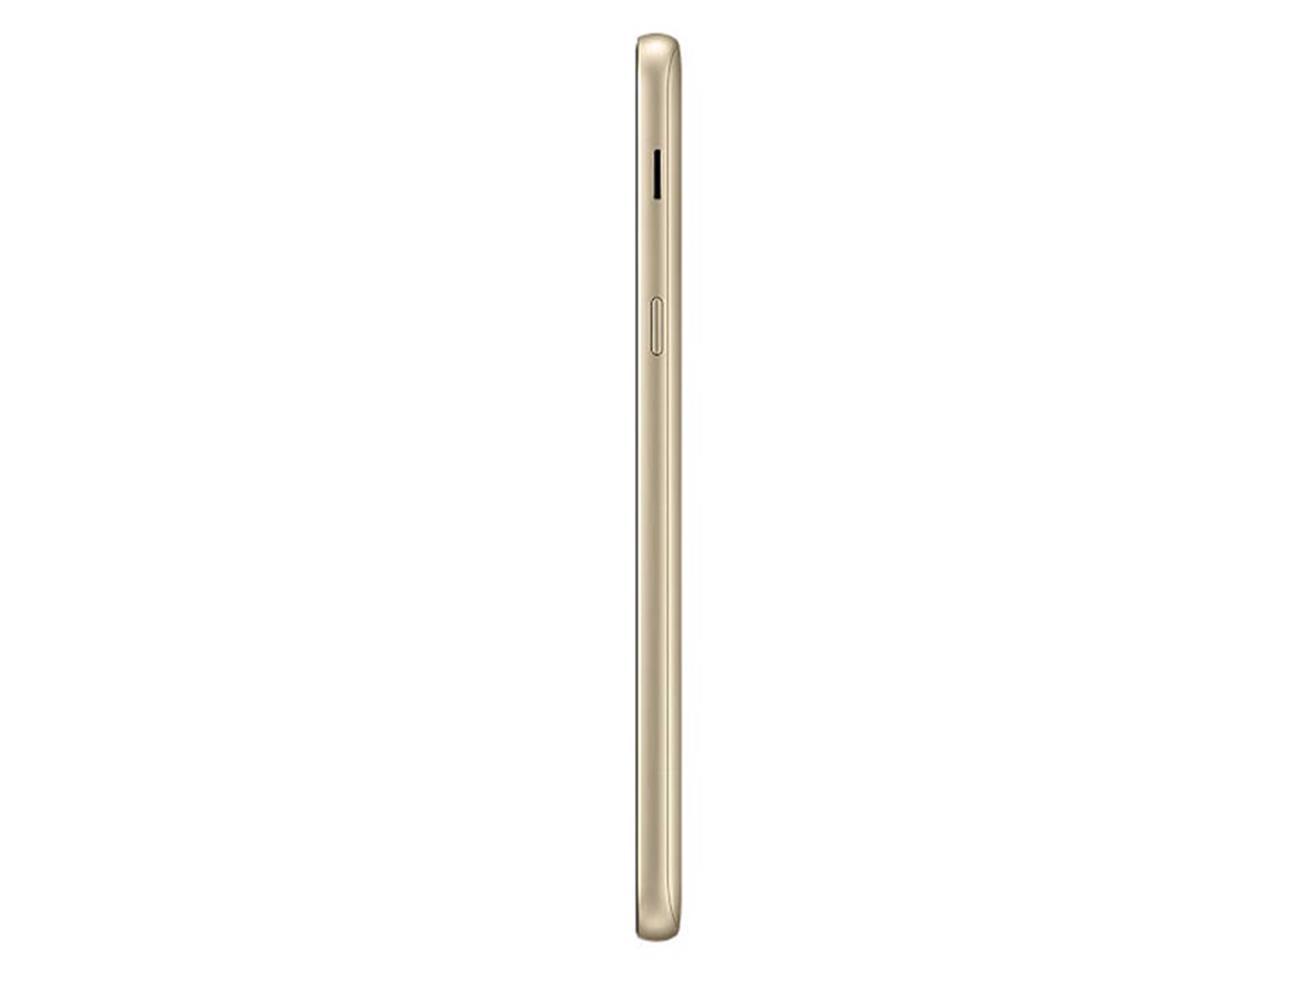 Samsung Galaxy J8 (2018) Smart Phone - 6 0